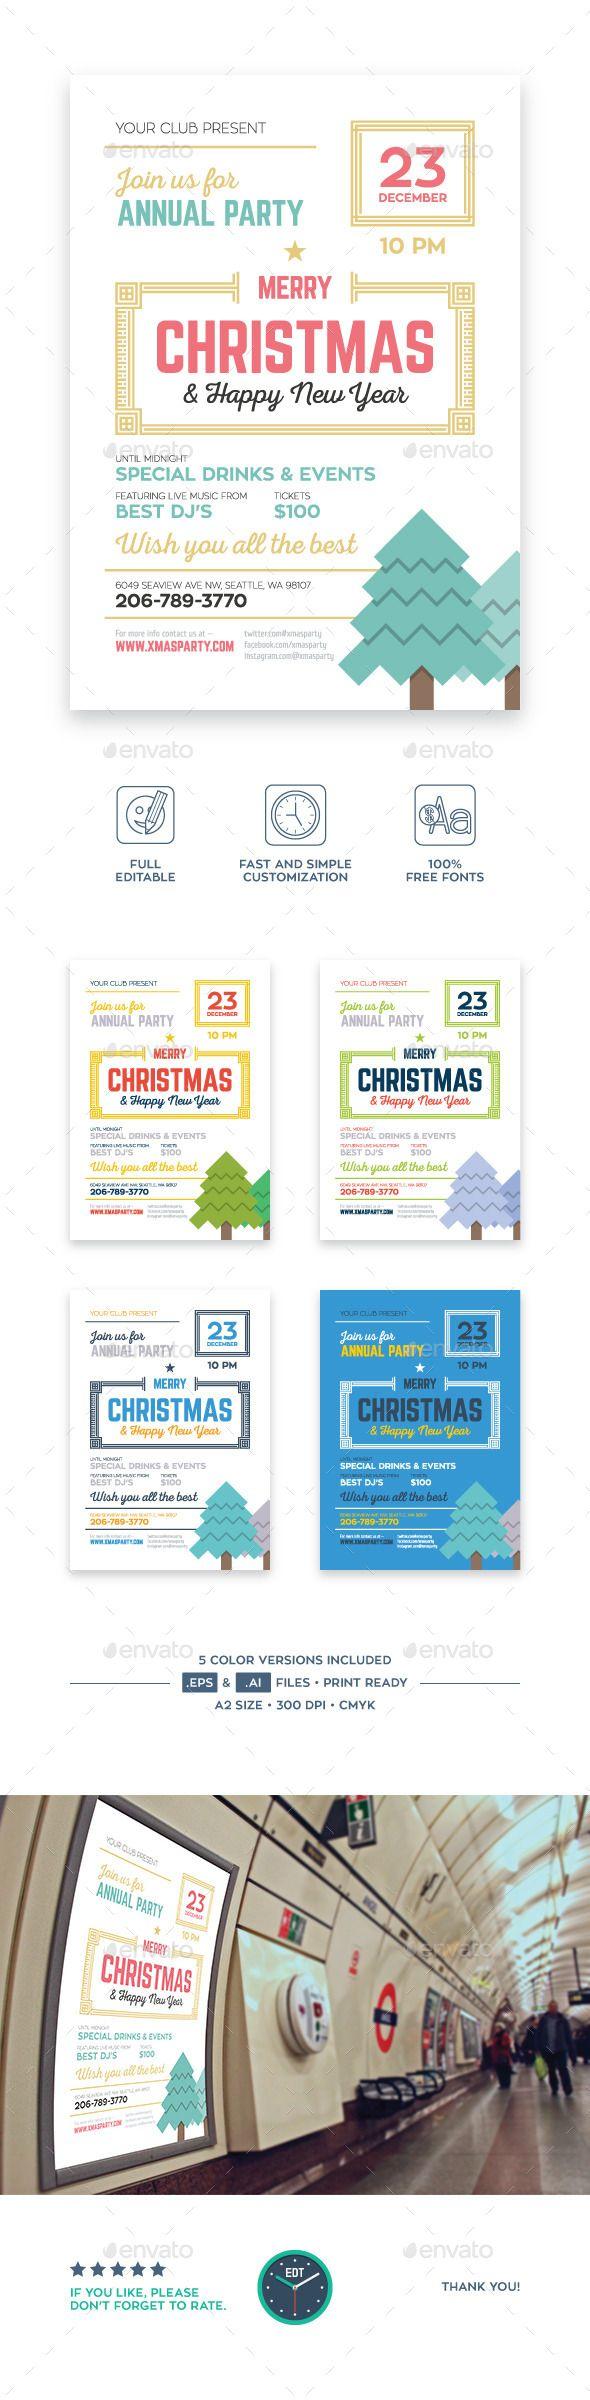 company christmas party invitation templates%0A Christmas Party Poster Vector Template EPS  AI  design  xmas Download  http